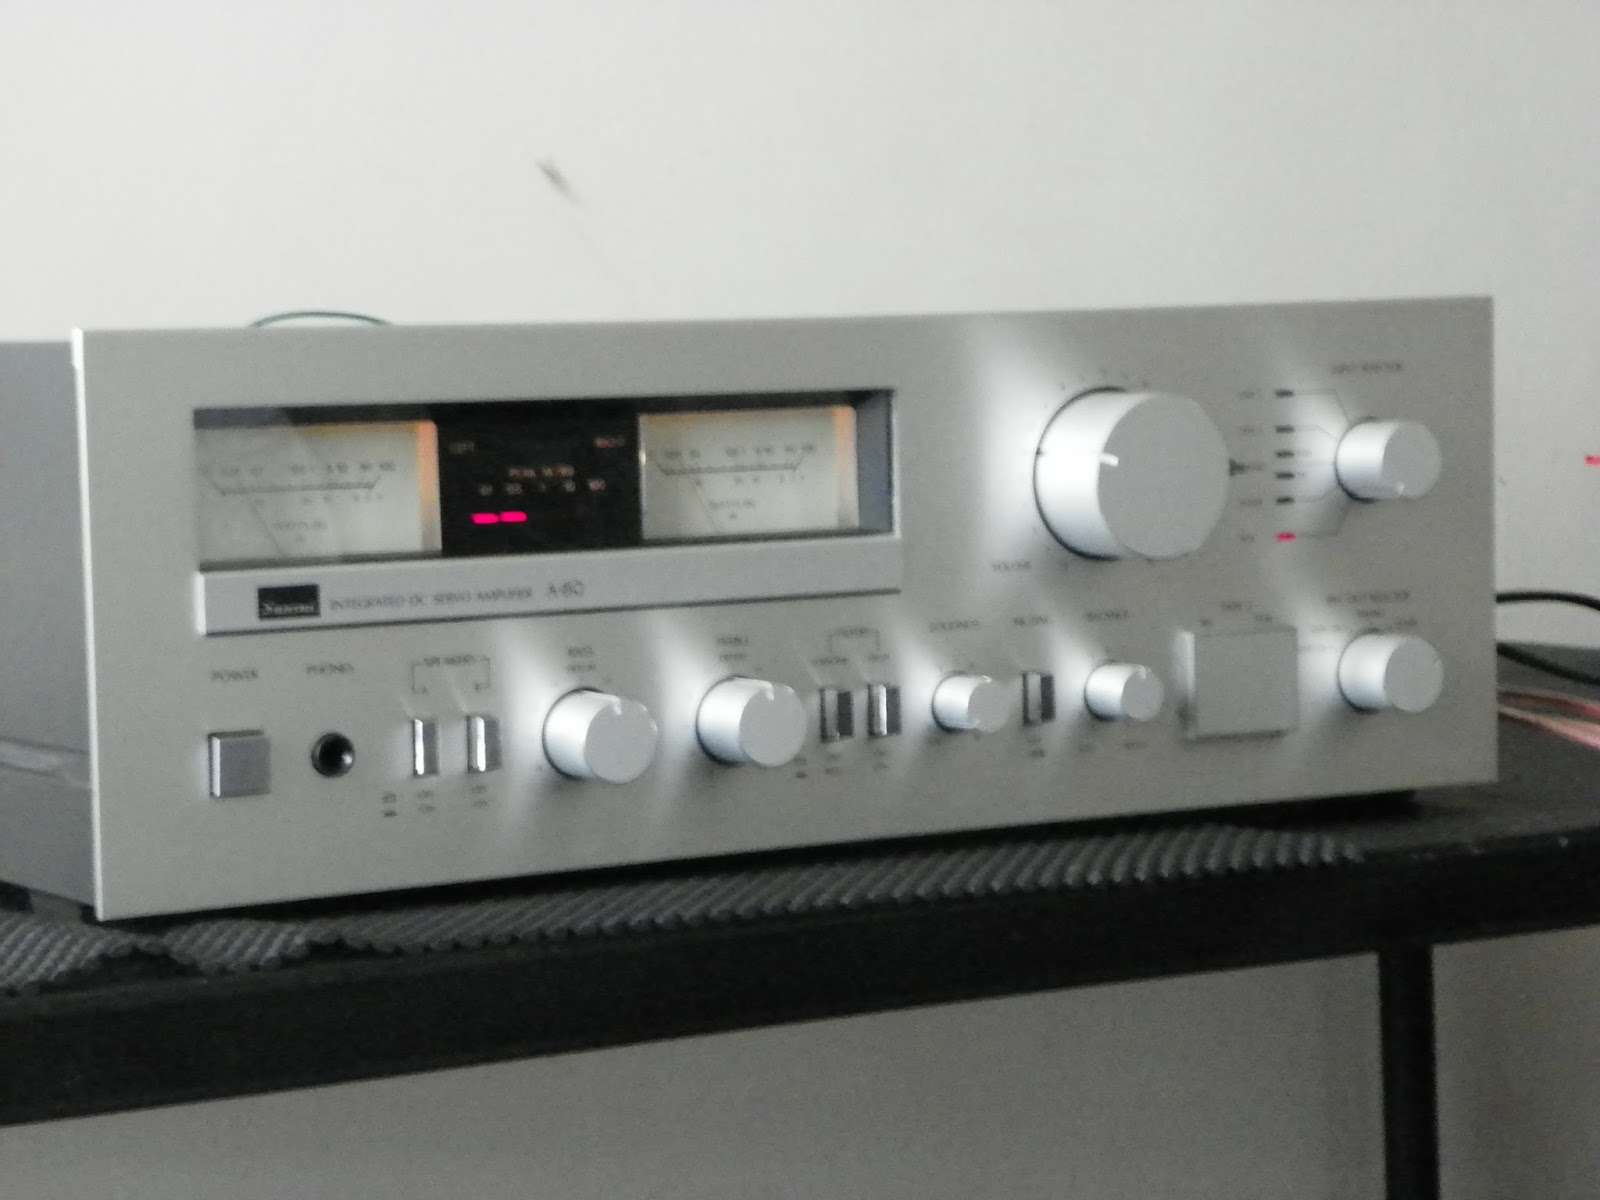 11 Meter Beam 3 Element Yagi For 11meter I1wqrlinkradio